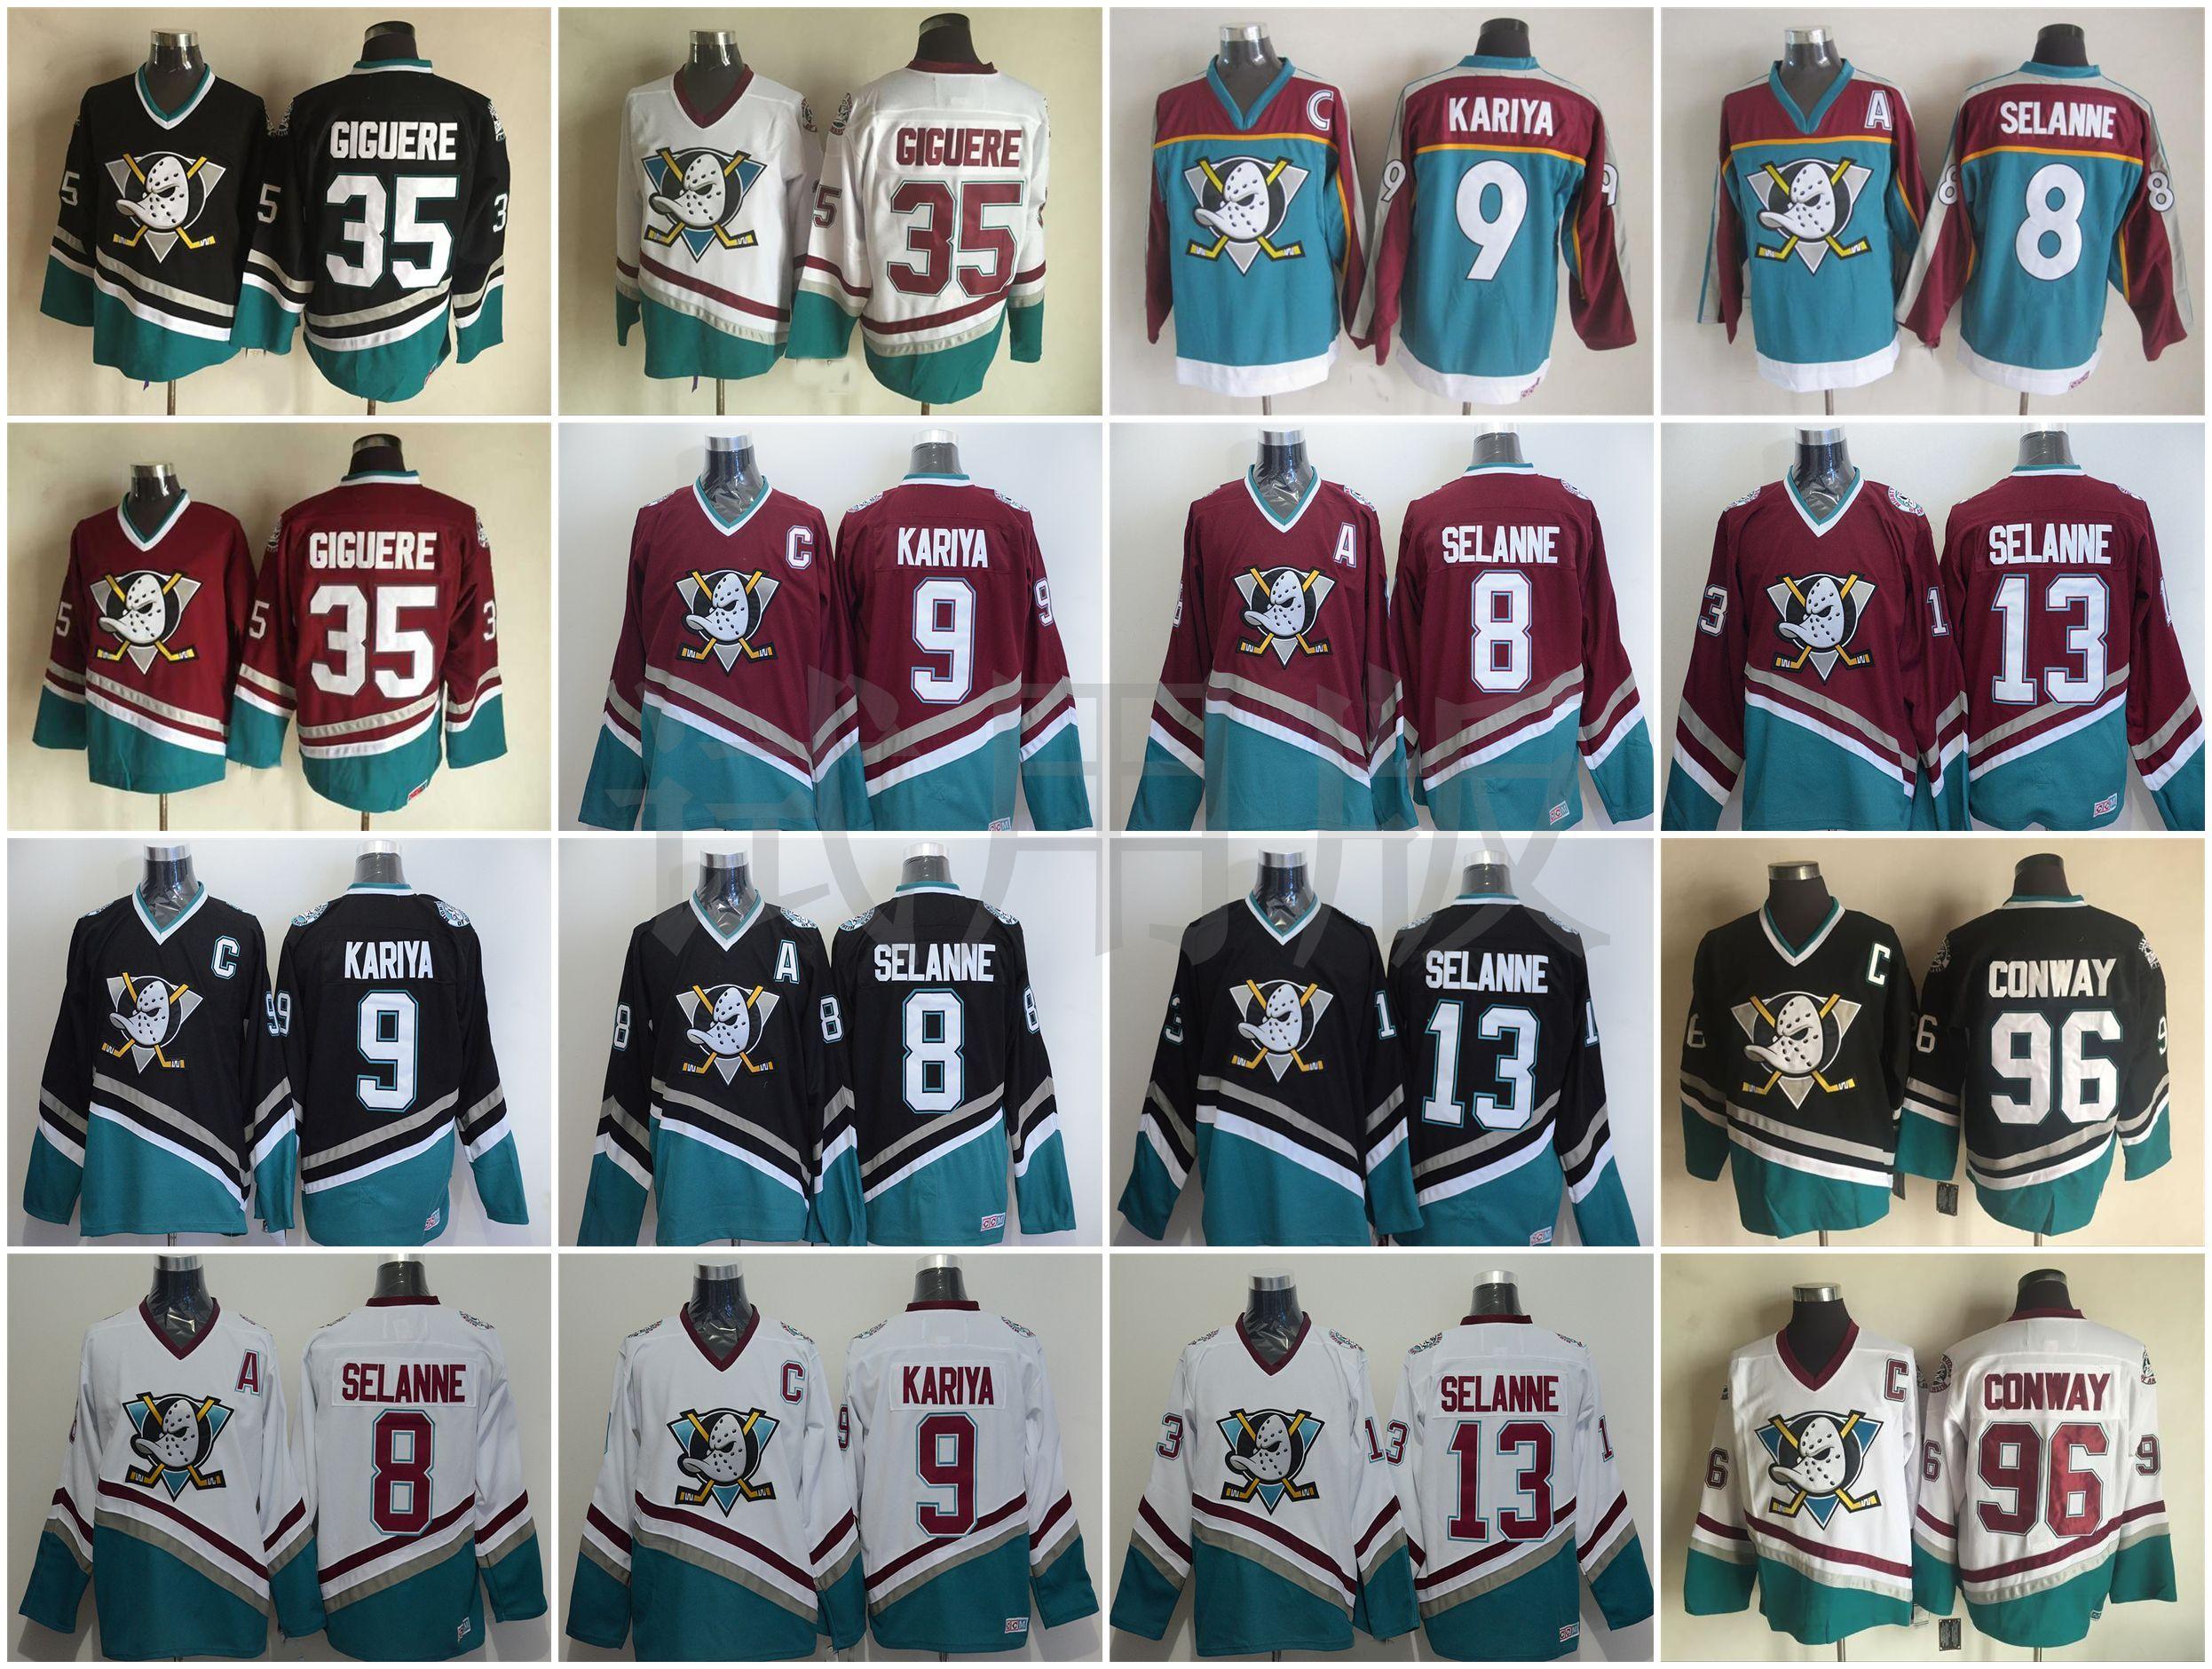 quality design 59667 9f462 ... promo code for 2019 vintage anaheim ducks hockey jerseys 8 teemu selanne  9 paul kariya 96